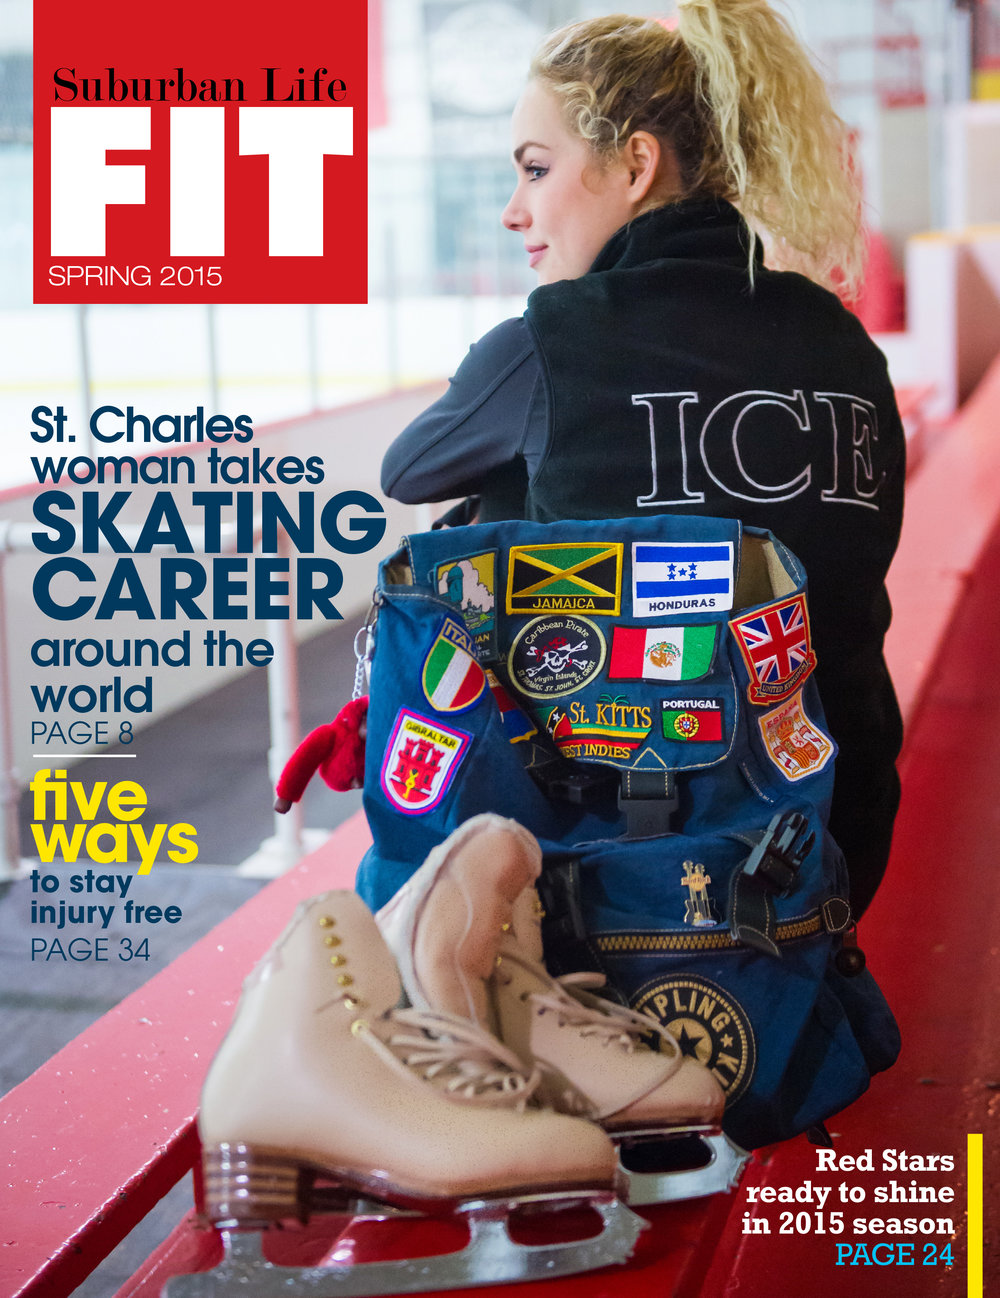 9 SLFit_April 2105 Cover.jpg